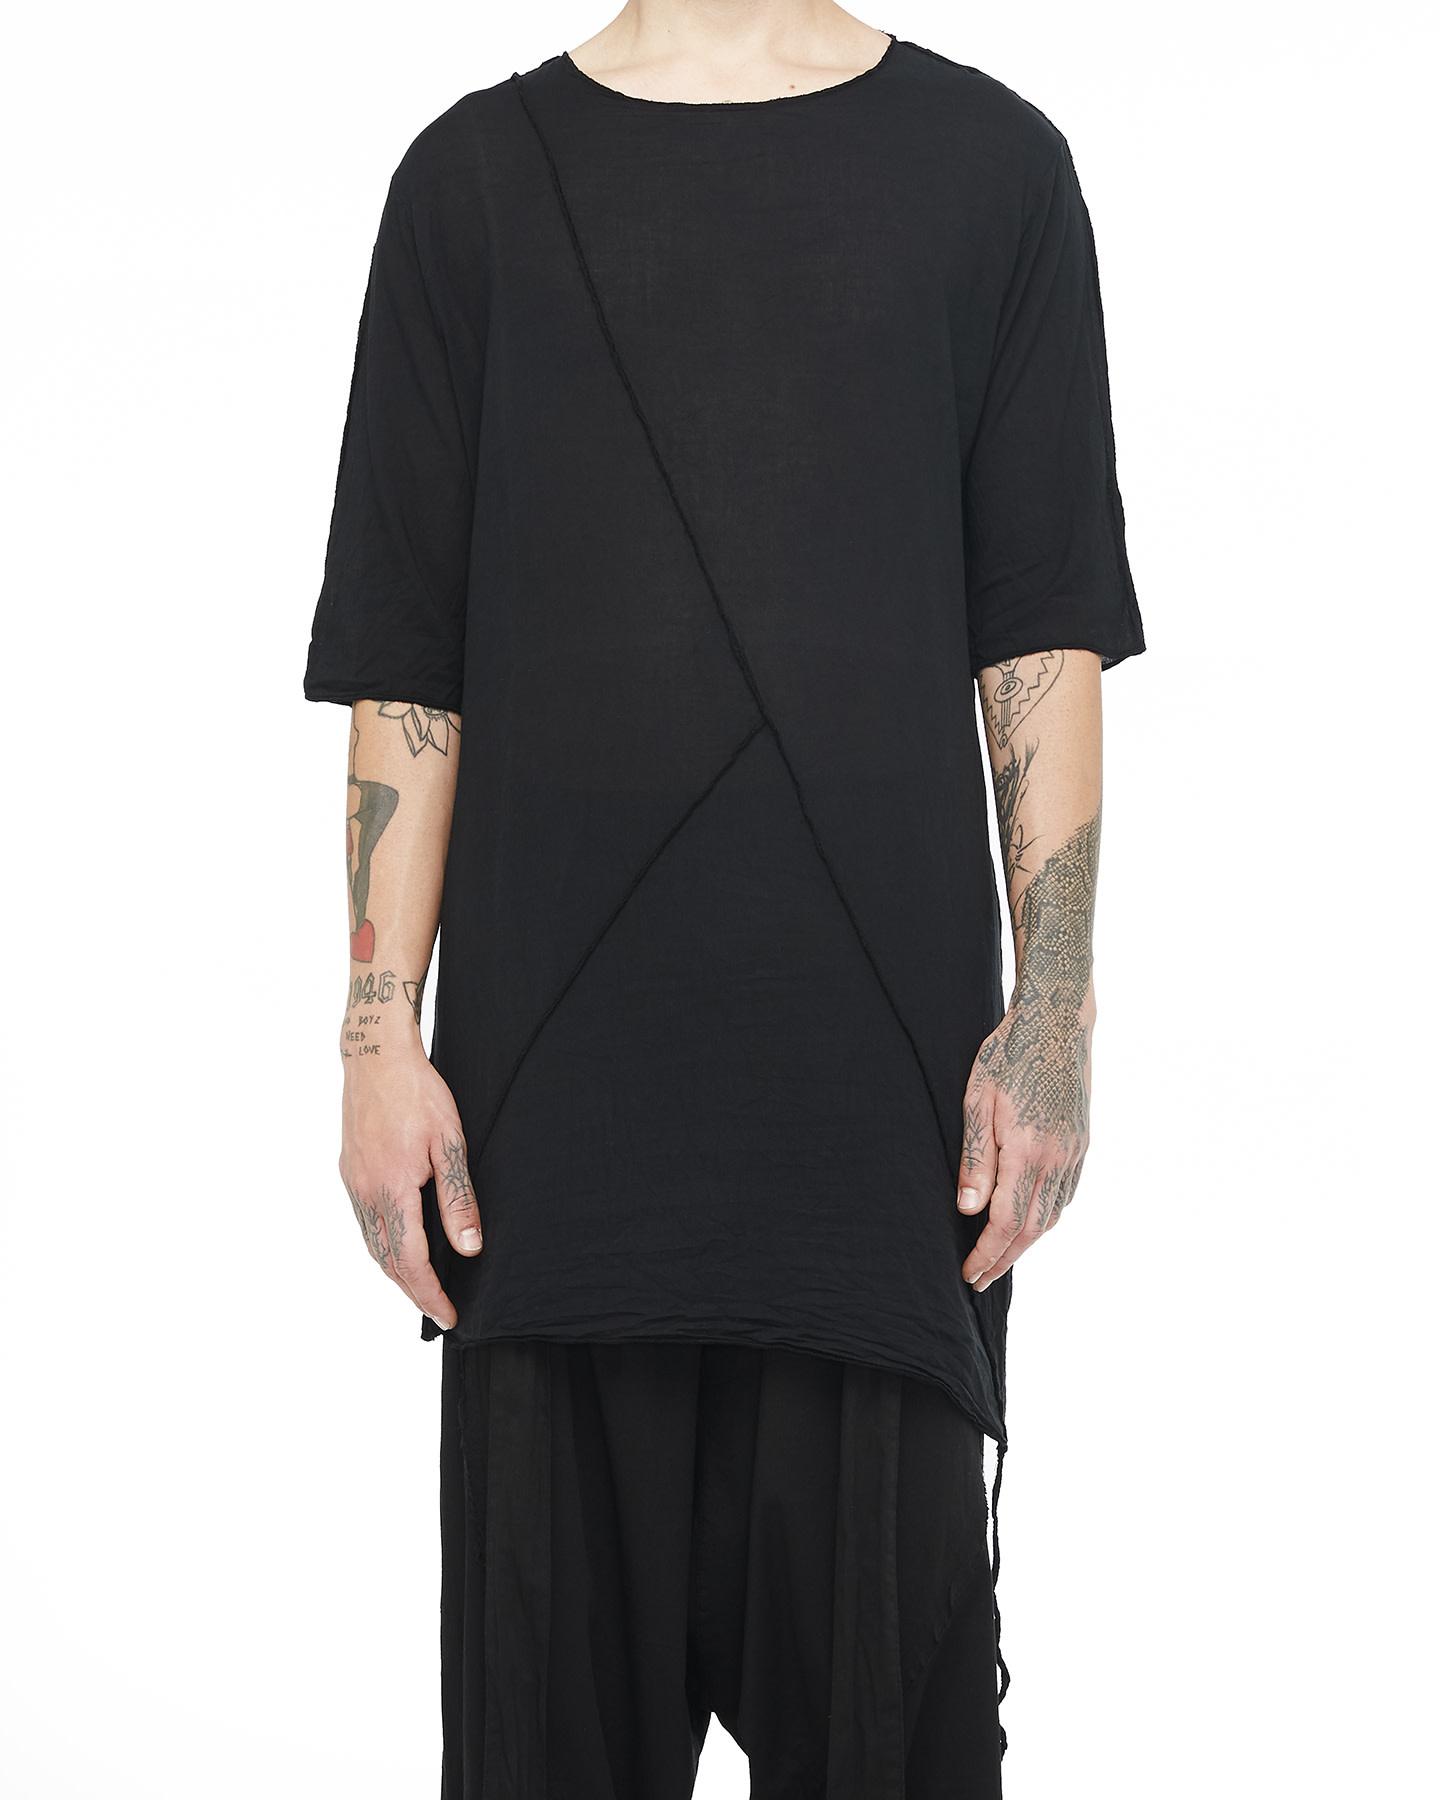 LONG SHIRT W/ BUTTONED SIDE - BLACK